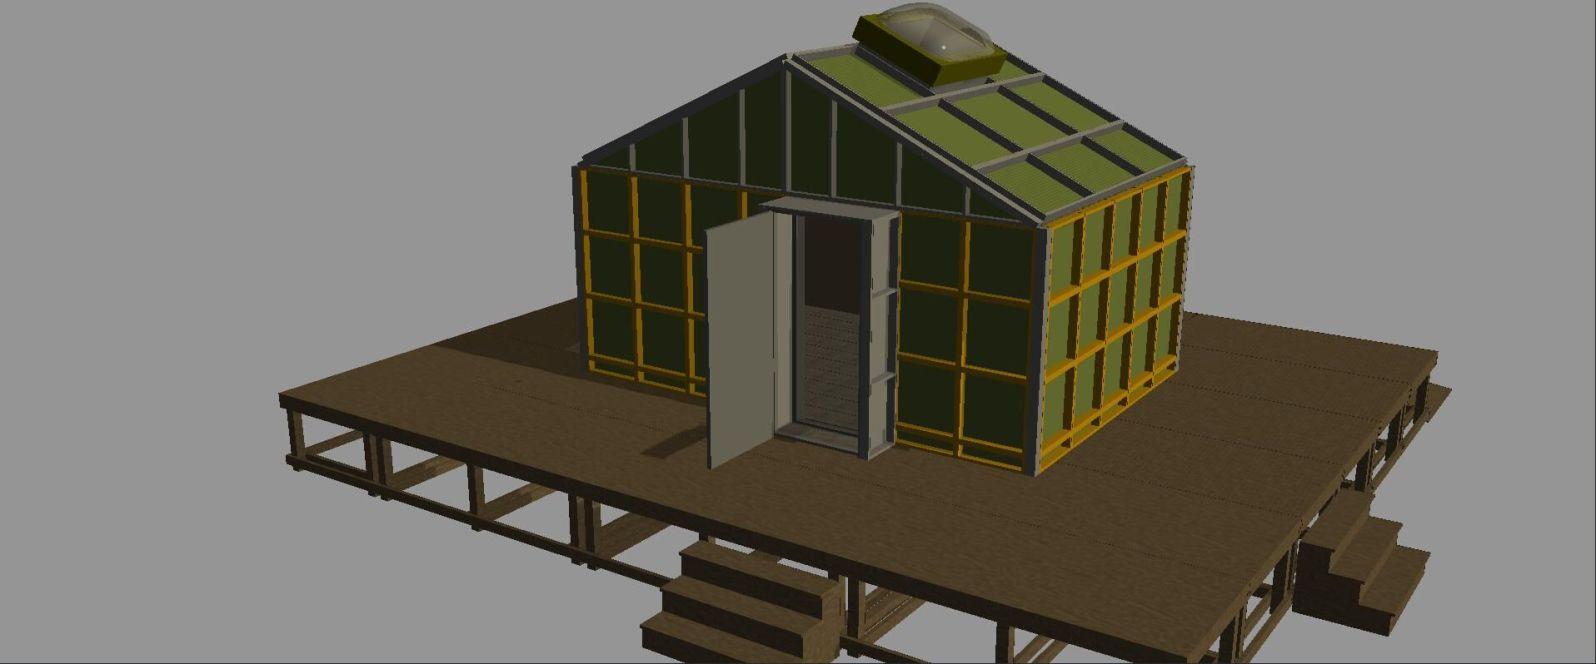 Sketchup model- exterior